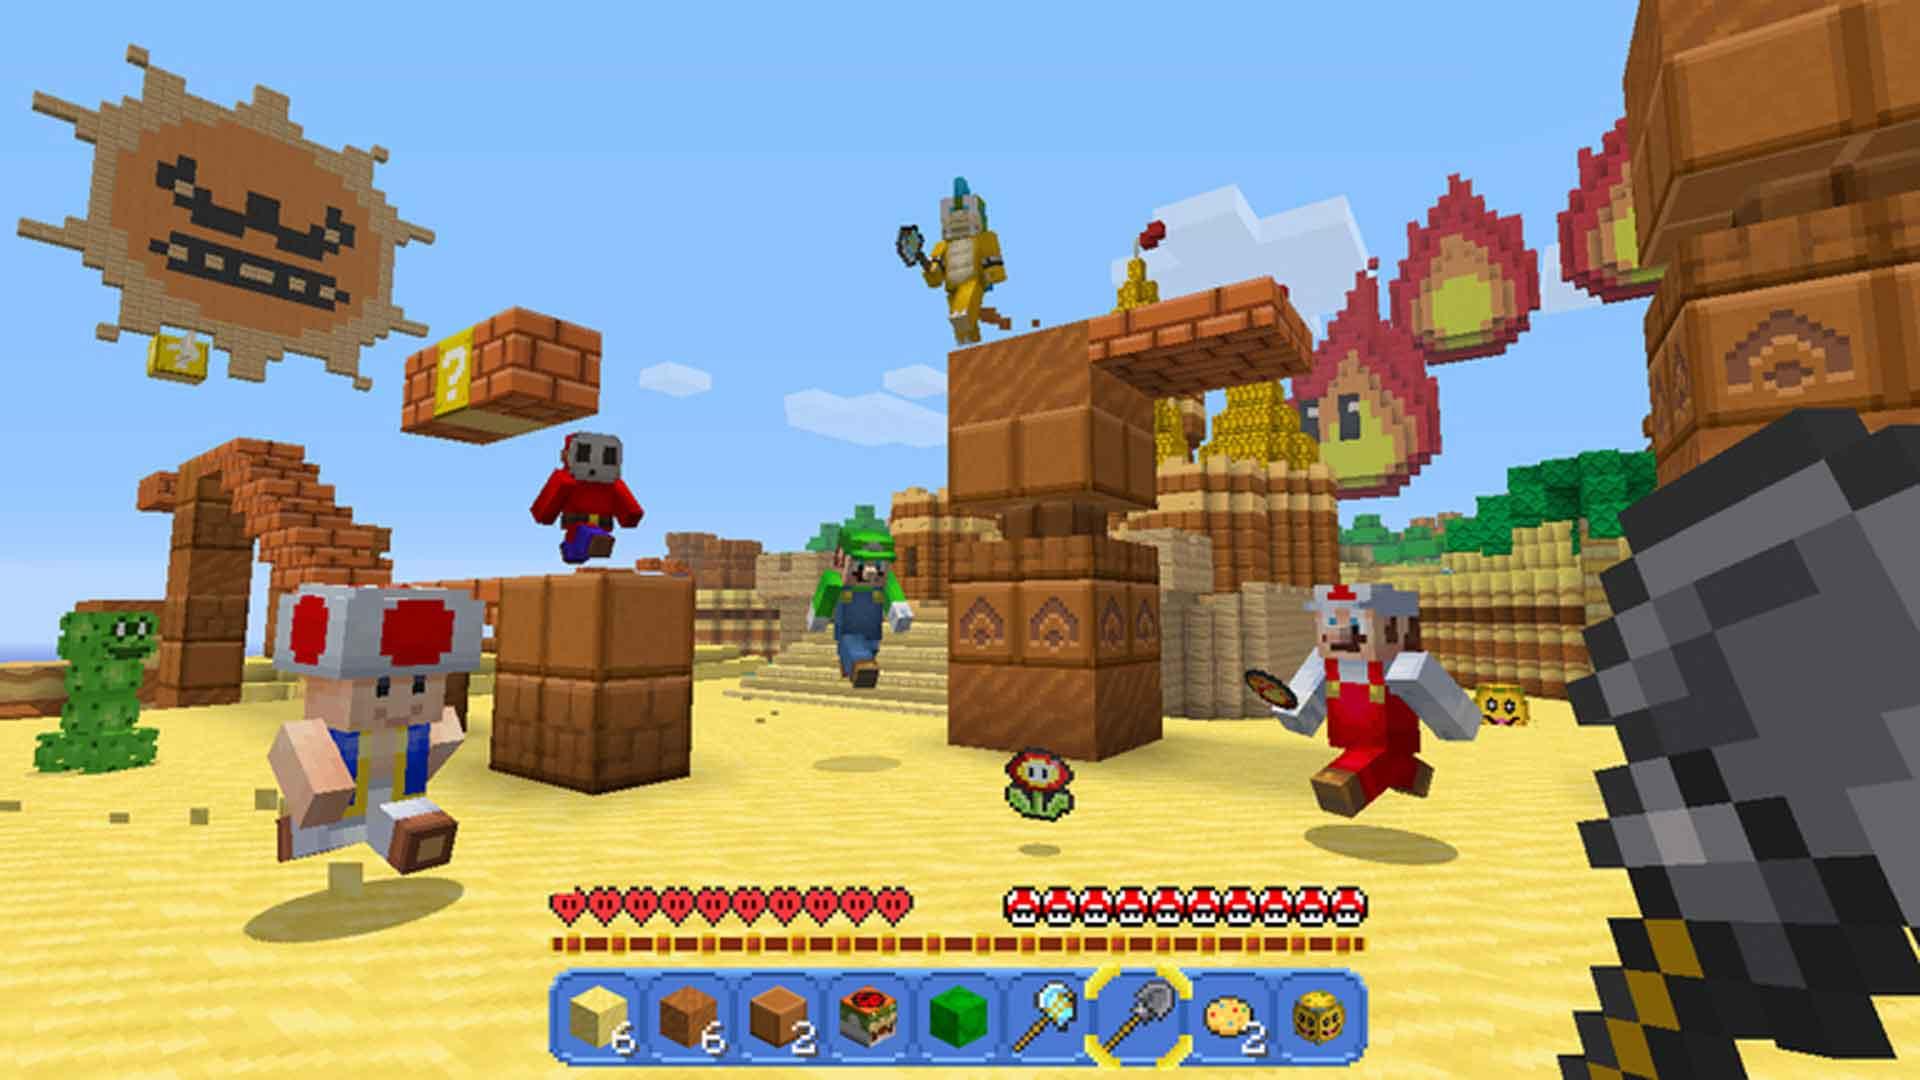 Minecraft Nintendo Switch Edition Screenshot